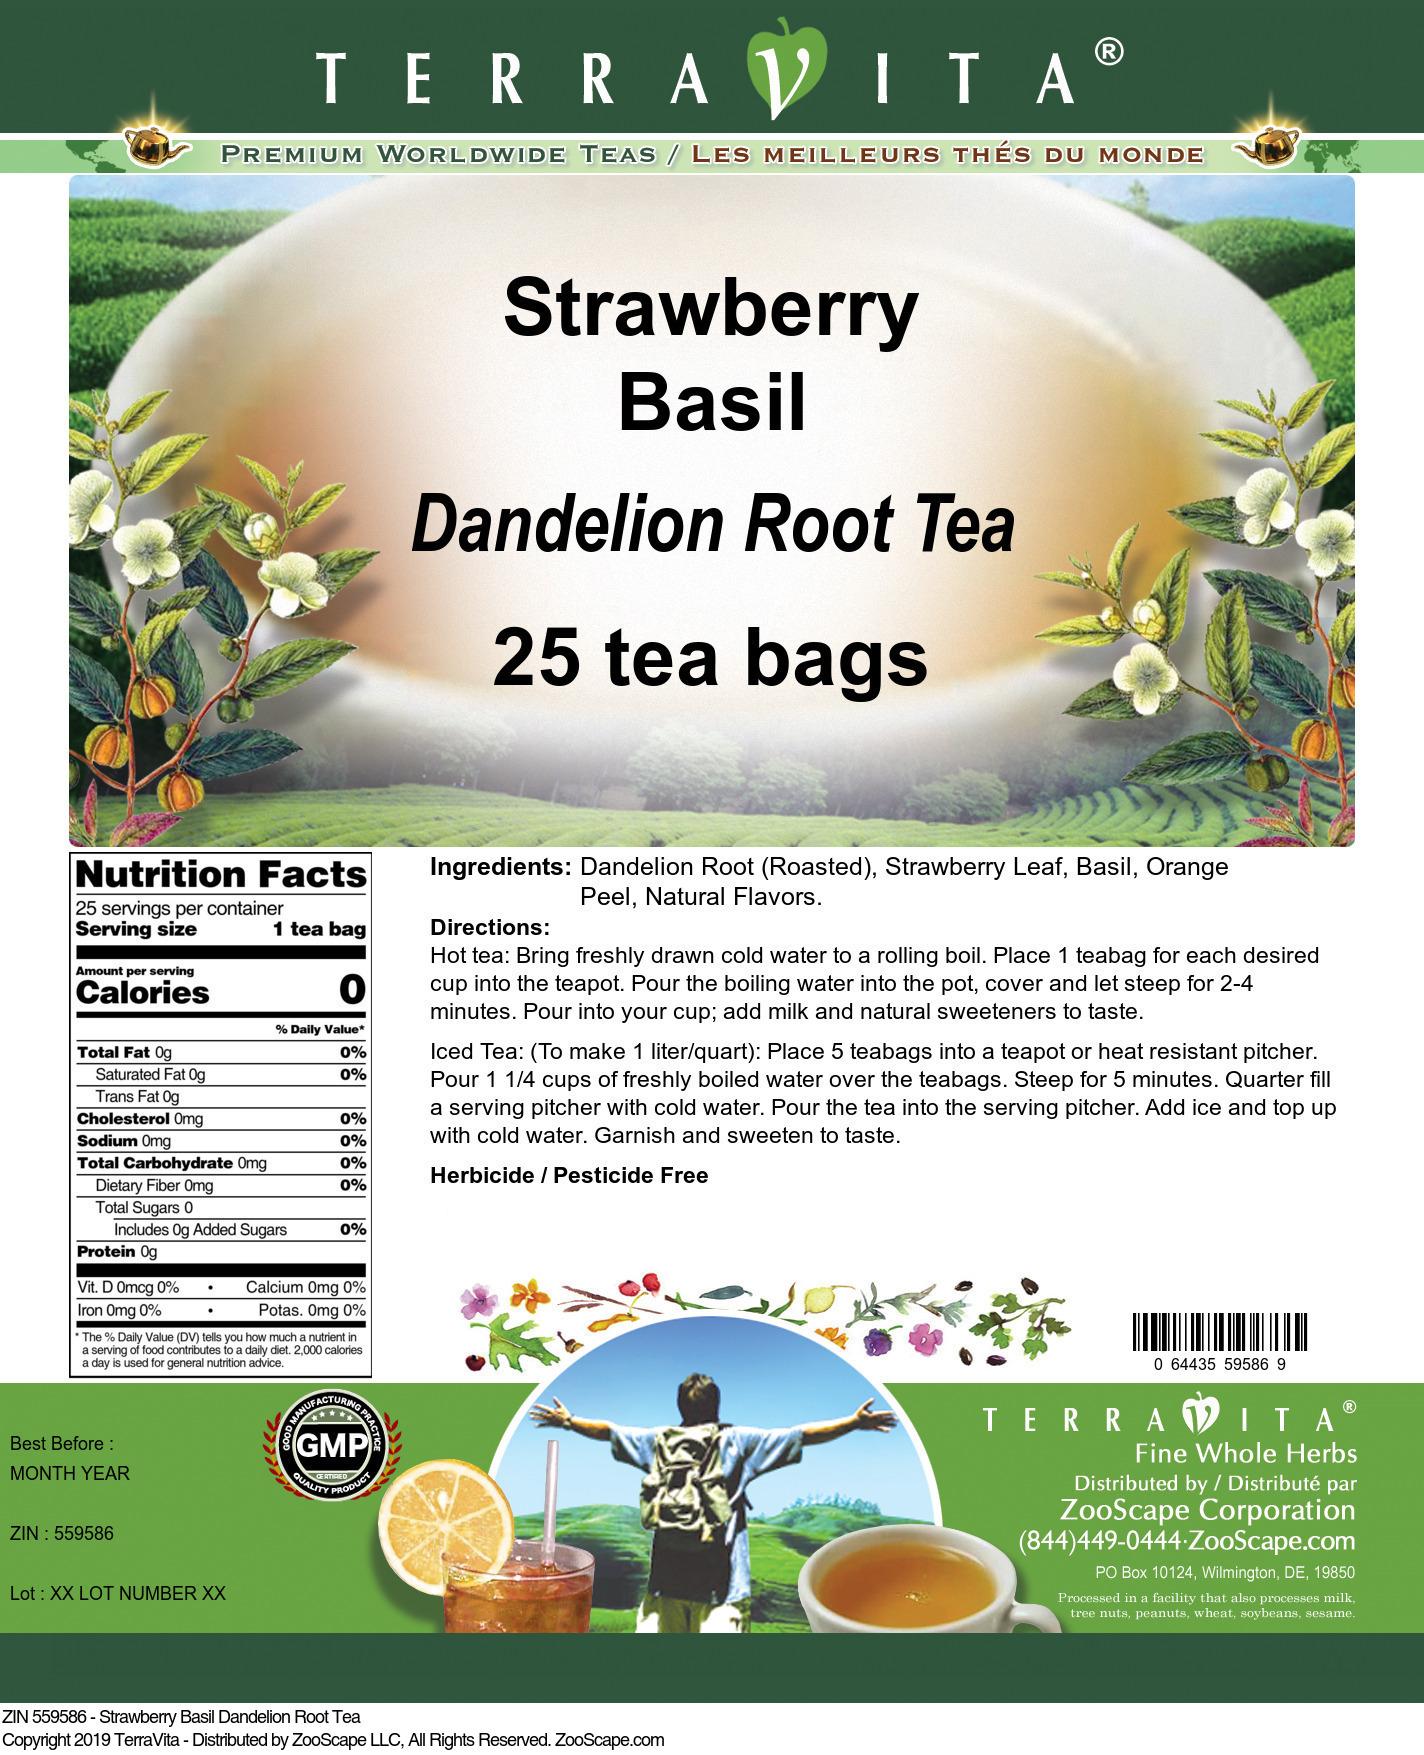 Strawberry Basil Dandelion Root